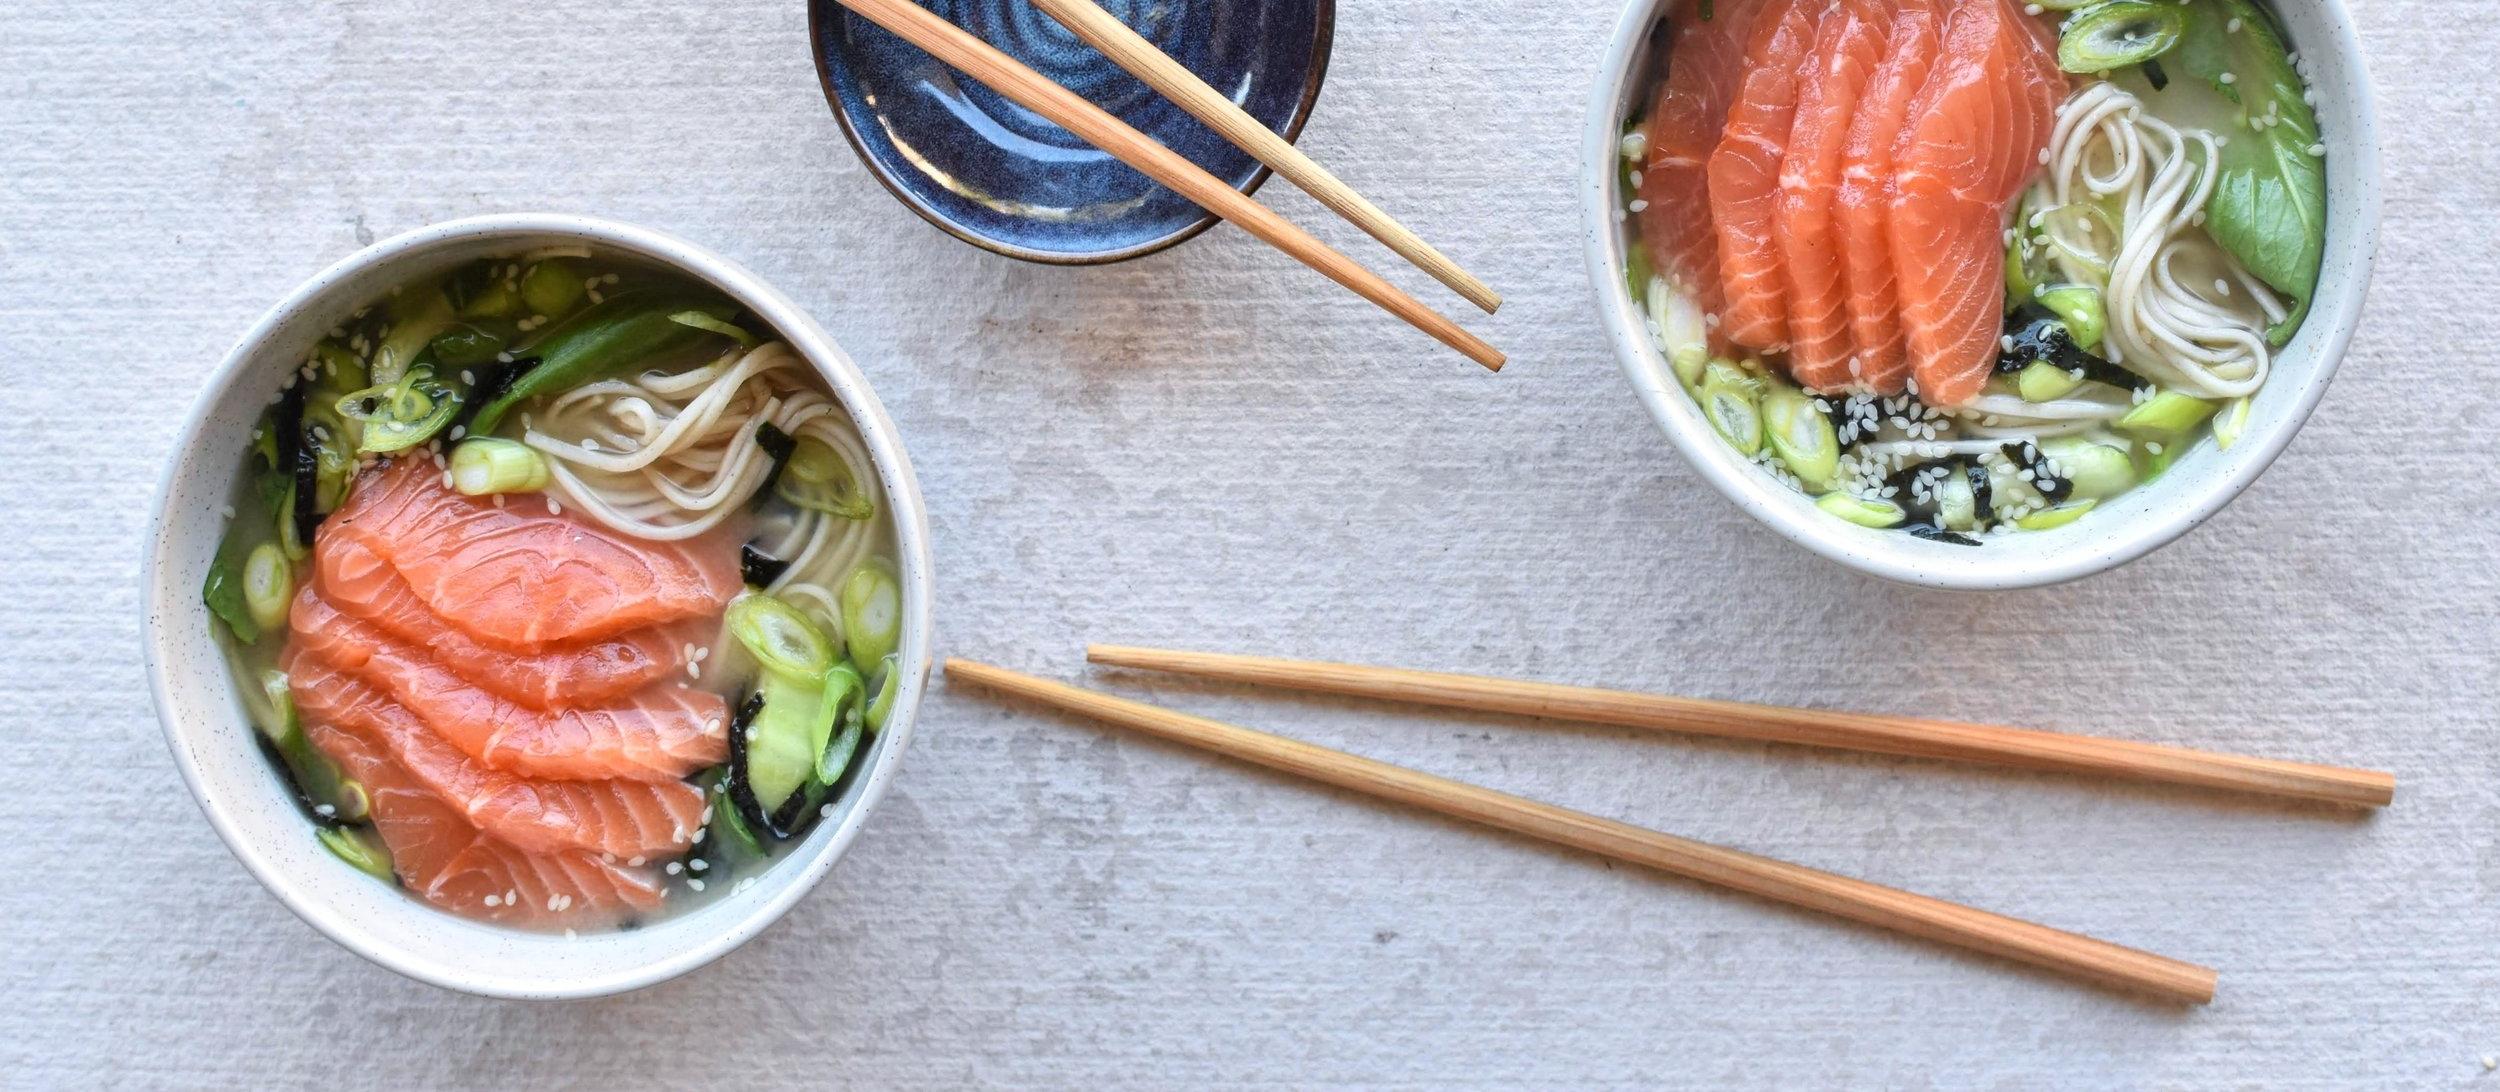 georgia-barnes-salmon-soba-miso-soup